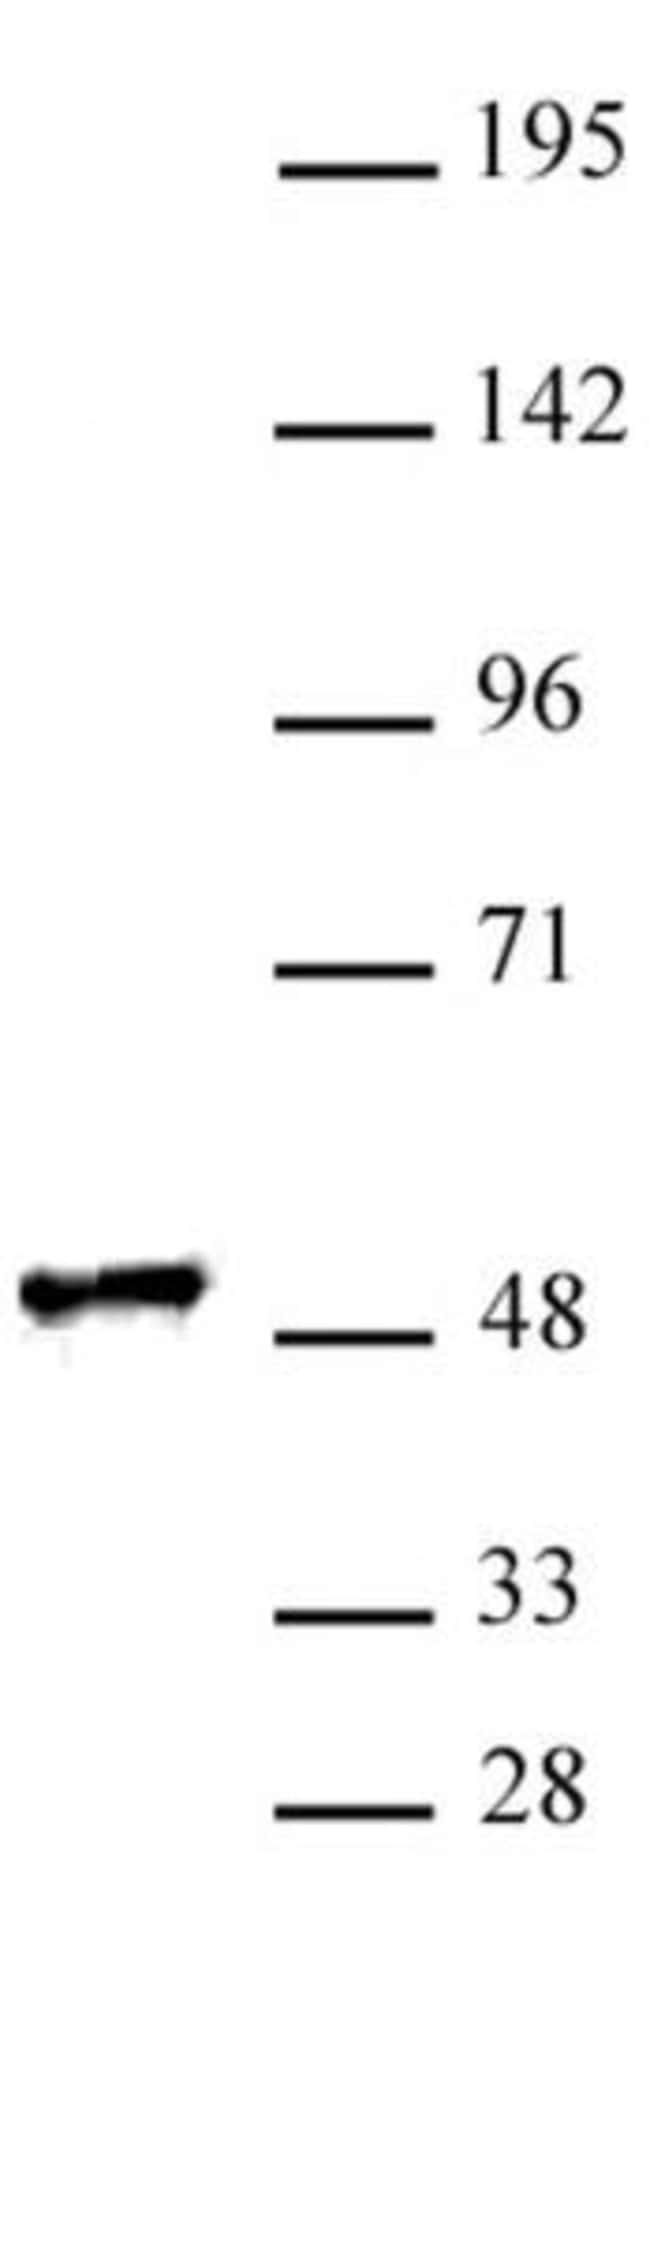 RING1 Rabbit anti-Human, Unconjugated, Polyclonal, Active Motif:Antibodies:Primary